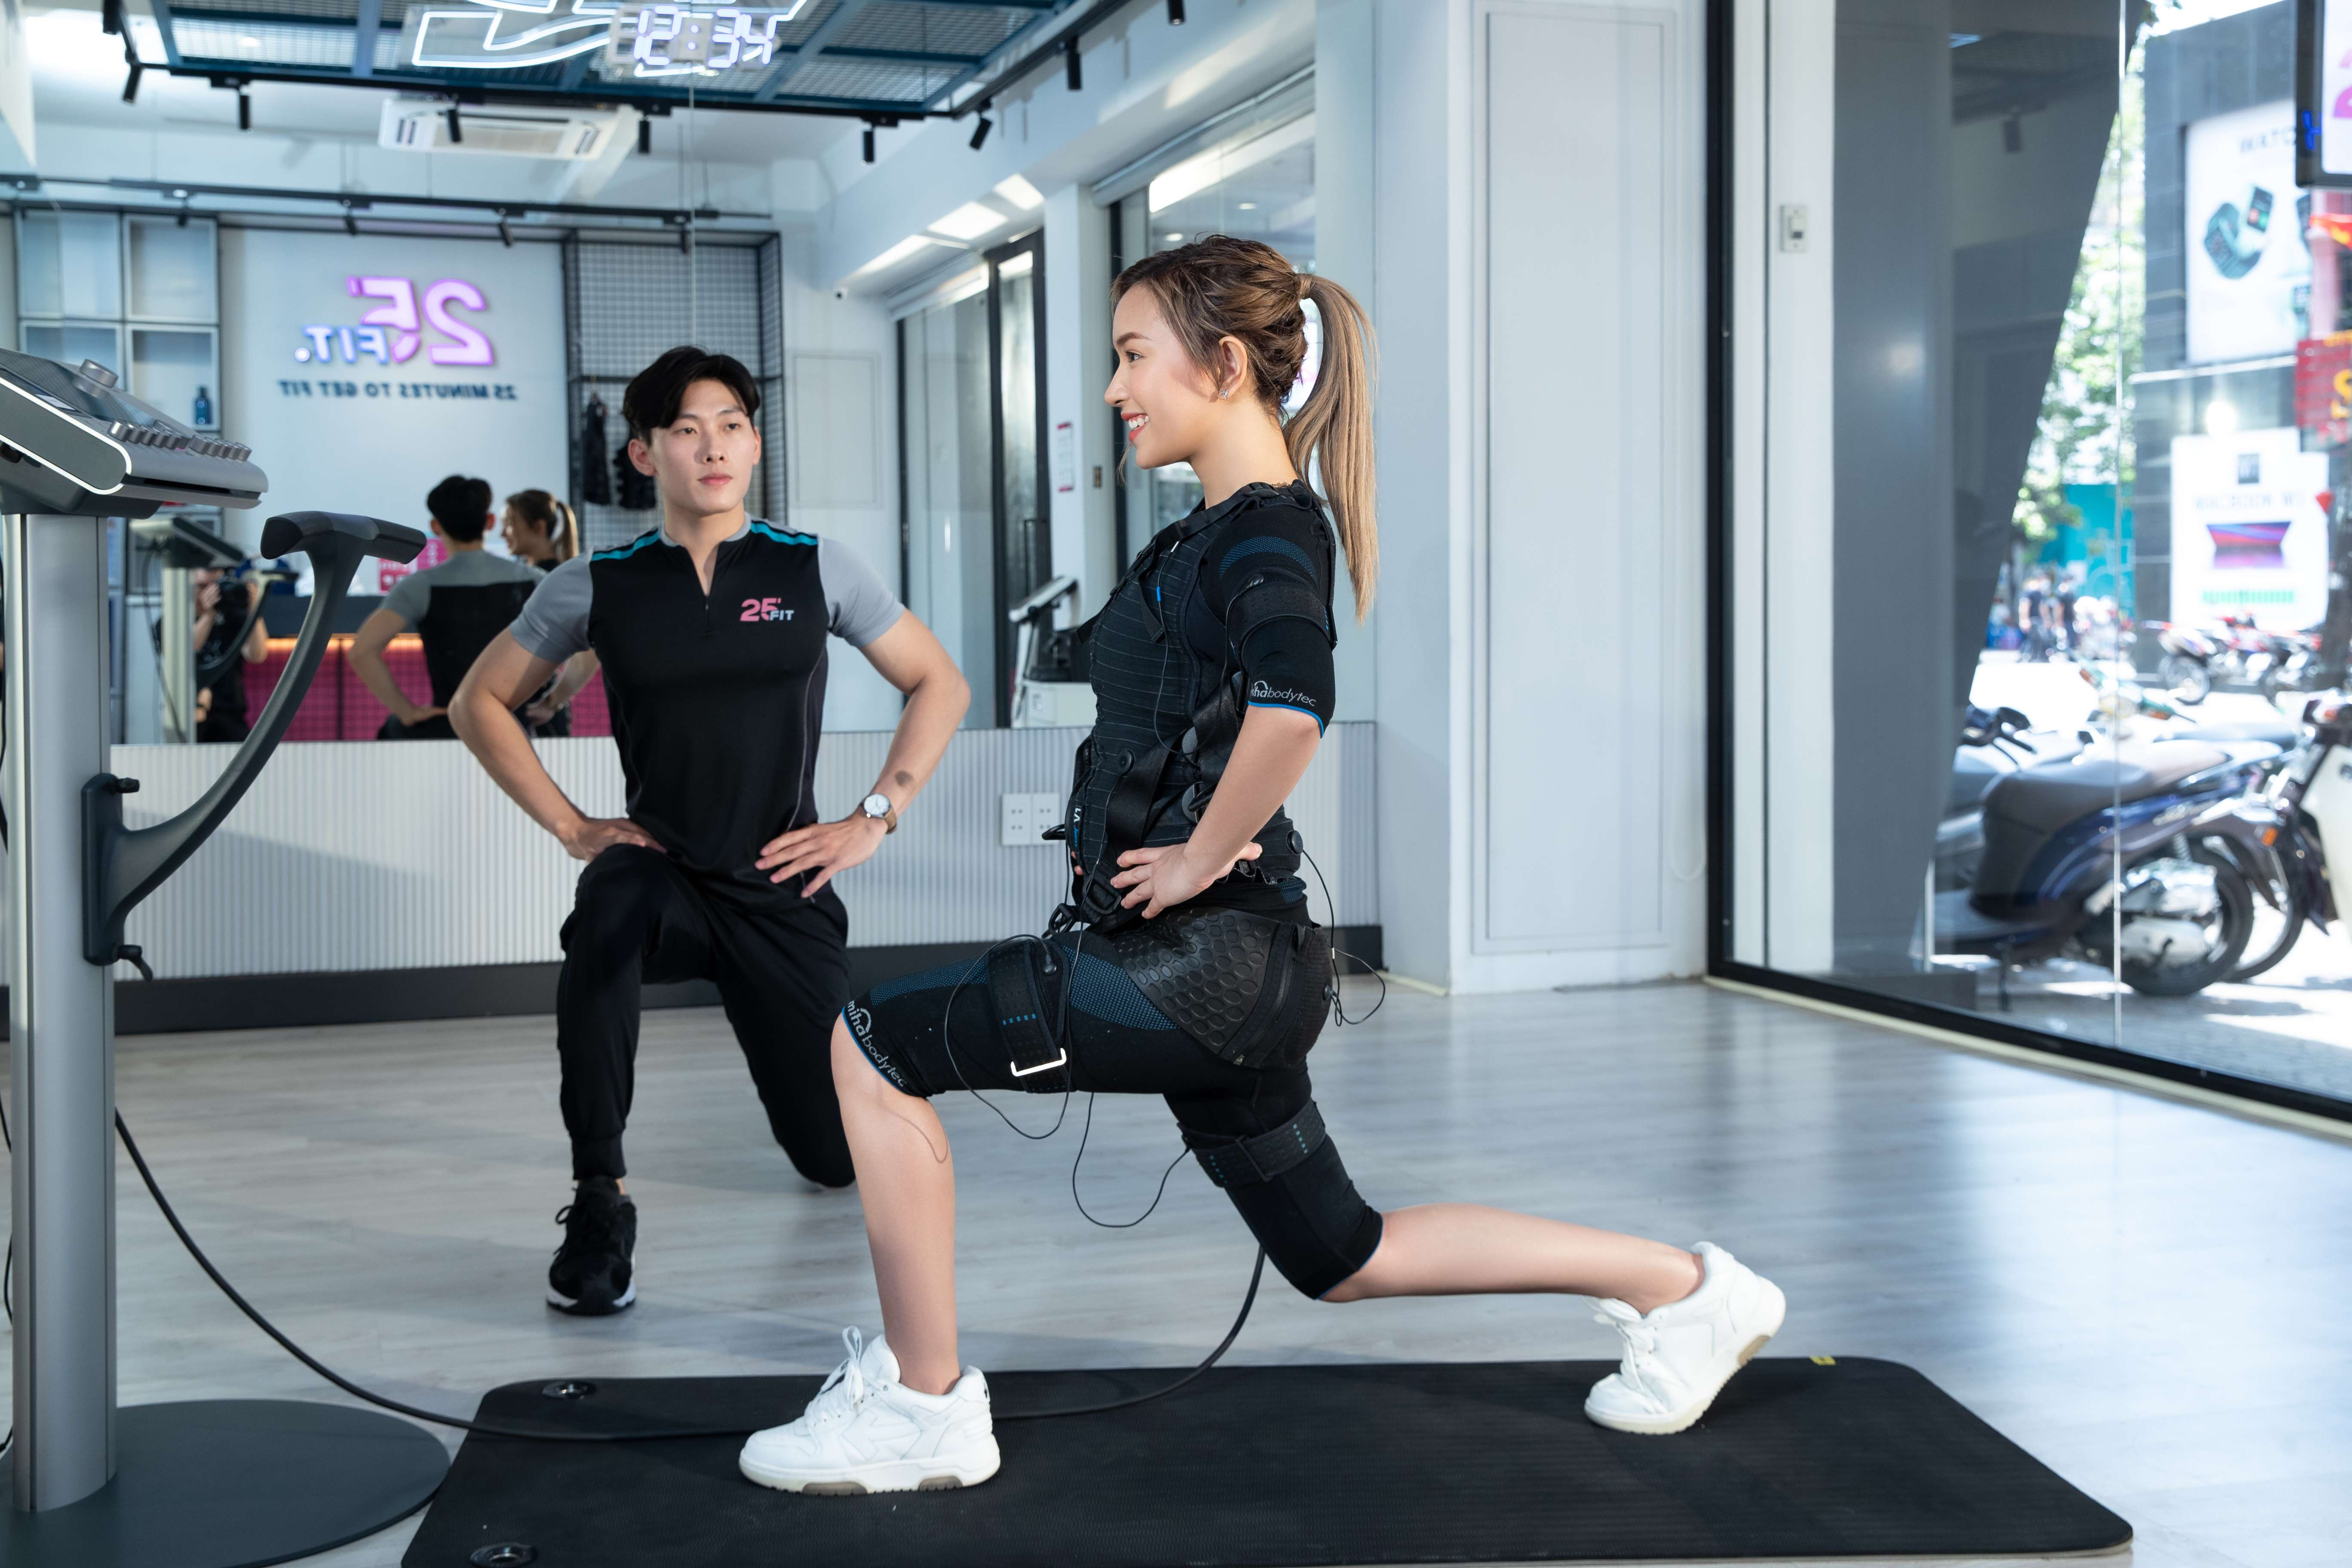 EMS-Training-la-gi? Tap-EMS-25-phut-co-hieu-qua-khong-1